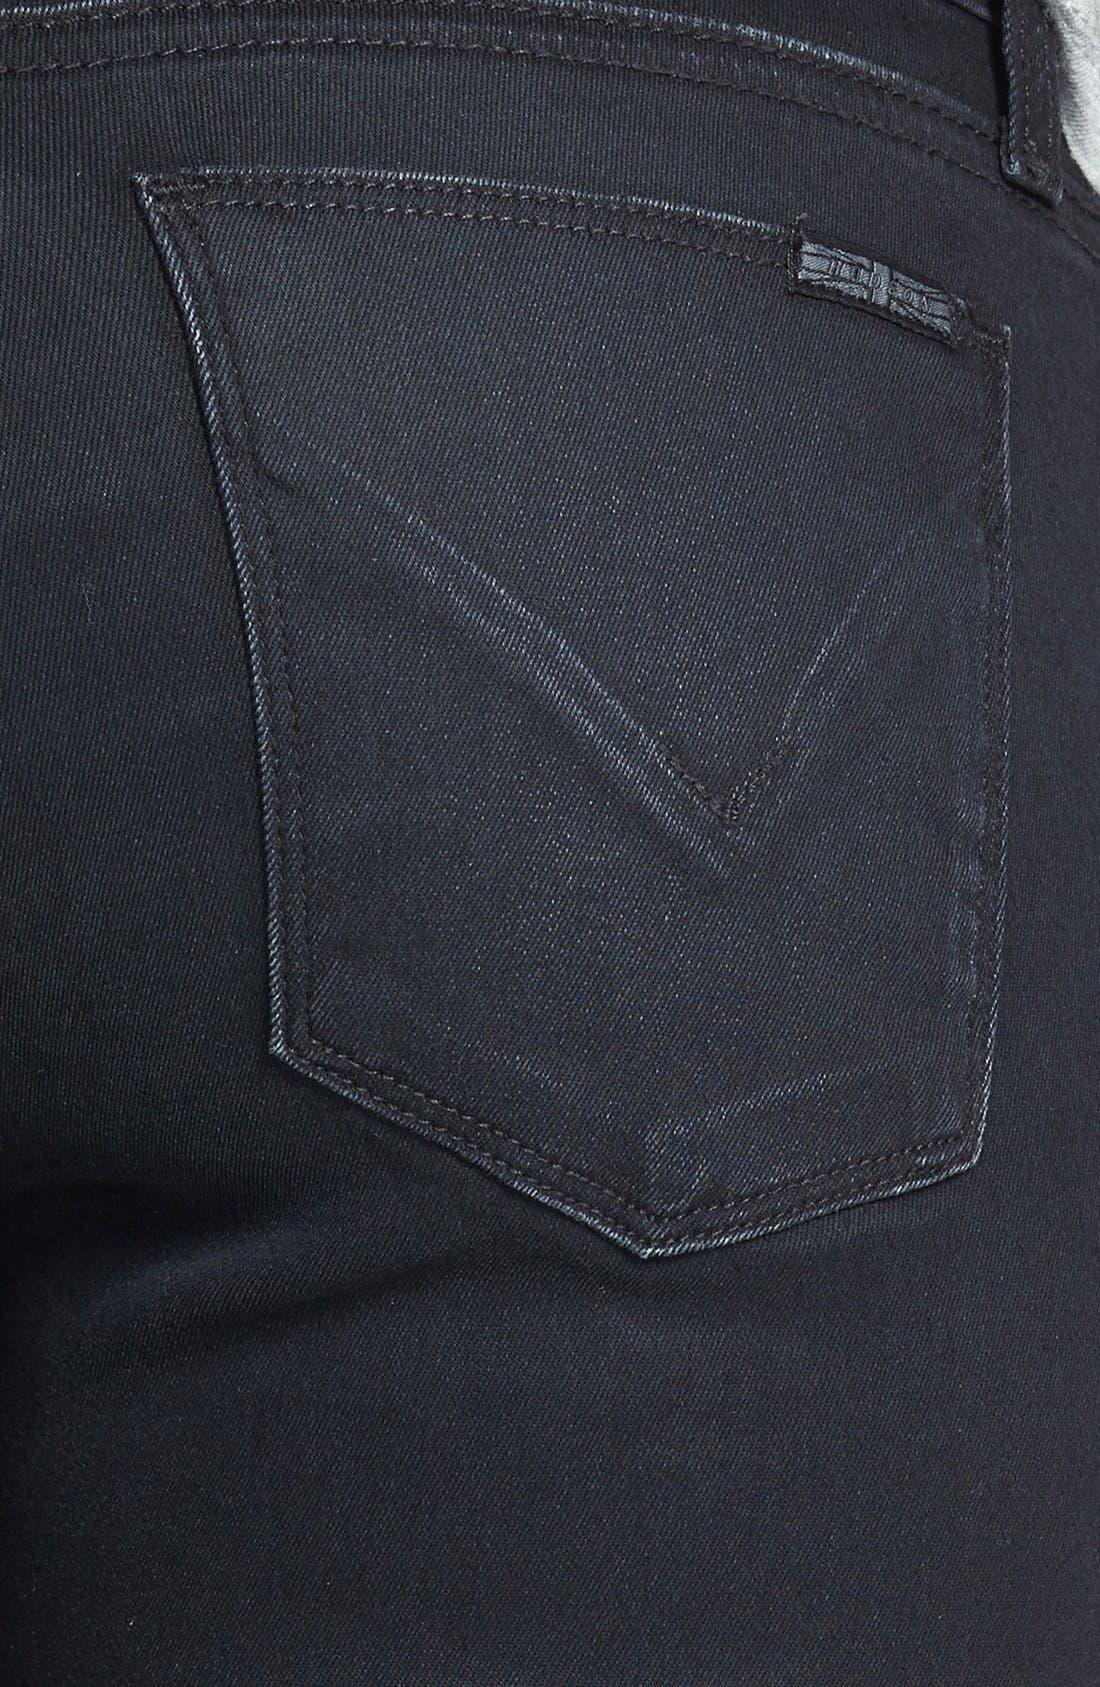 Alternate Image 3  - Hudson Jeans 'Harkin' Skinny Jeans (Shrine)